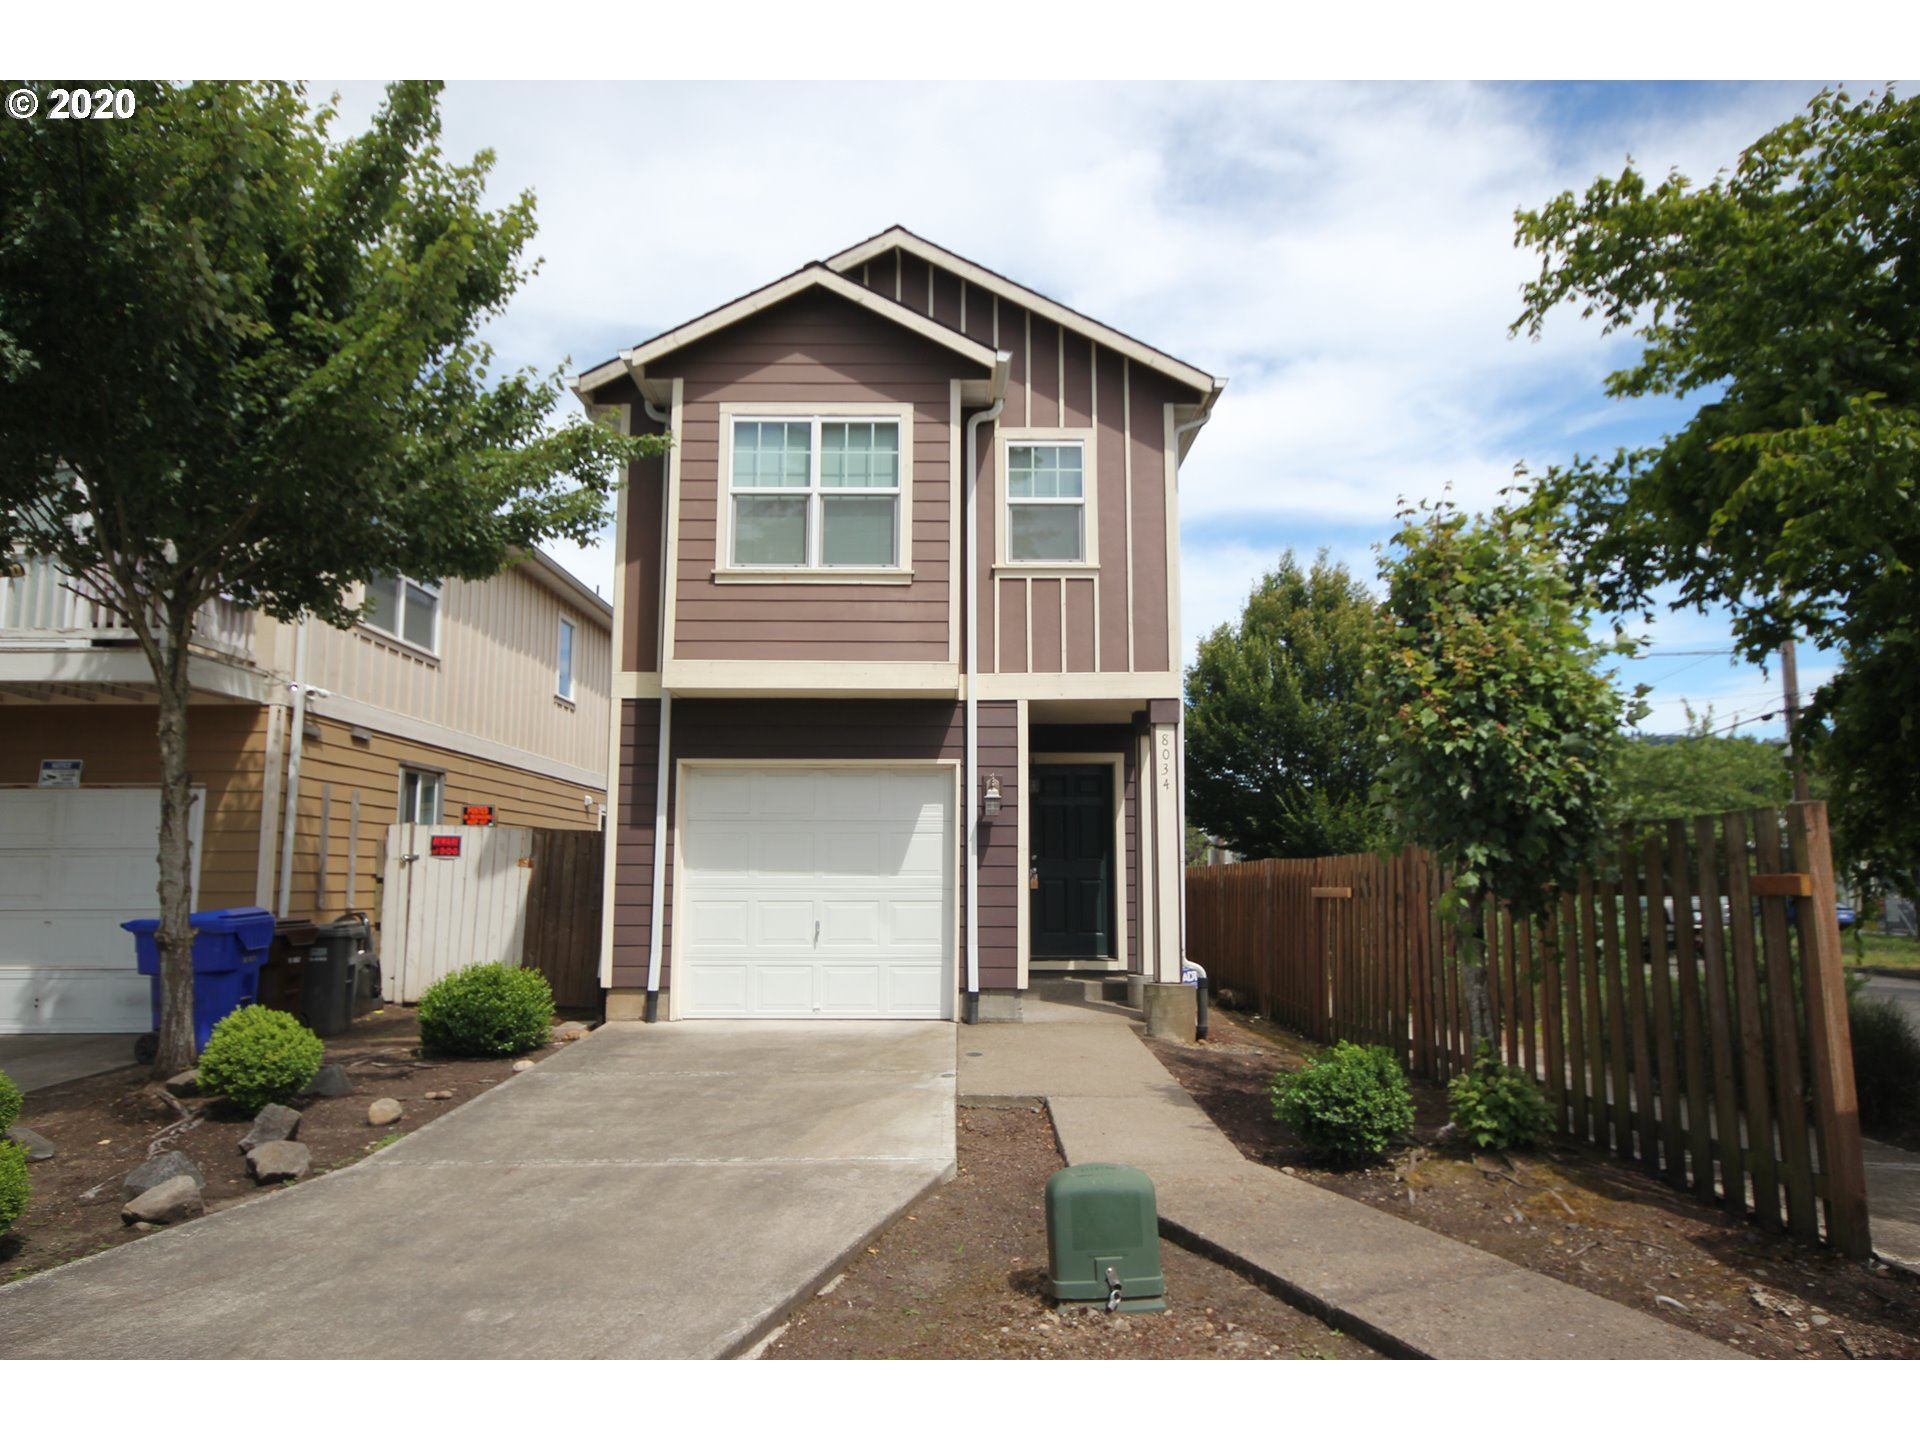 8034 SE 80TH PL, Portland, OR 97206 - MLS#: 20337452